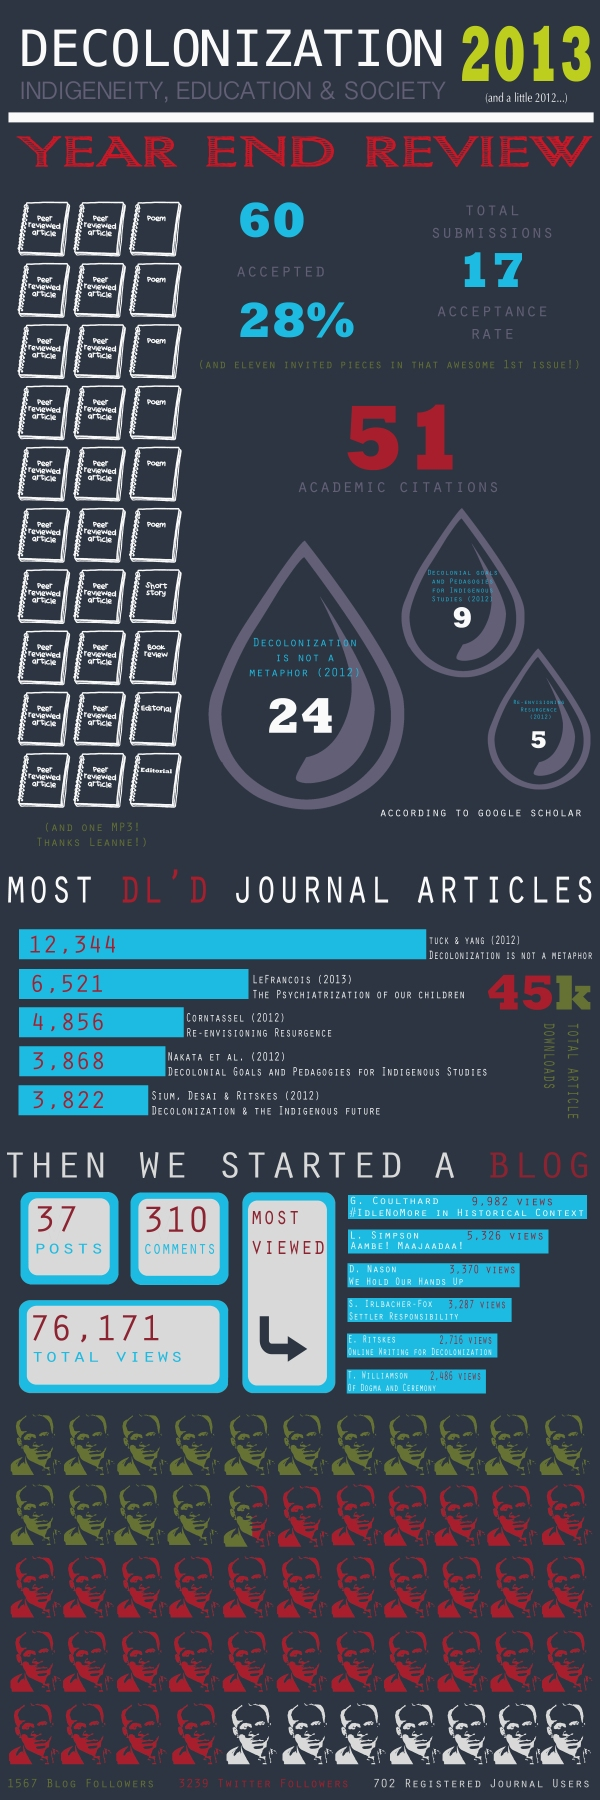 2013 Decolonization infographic